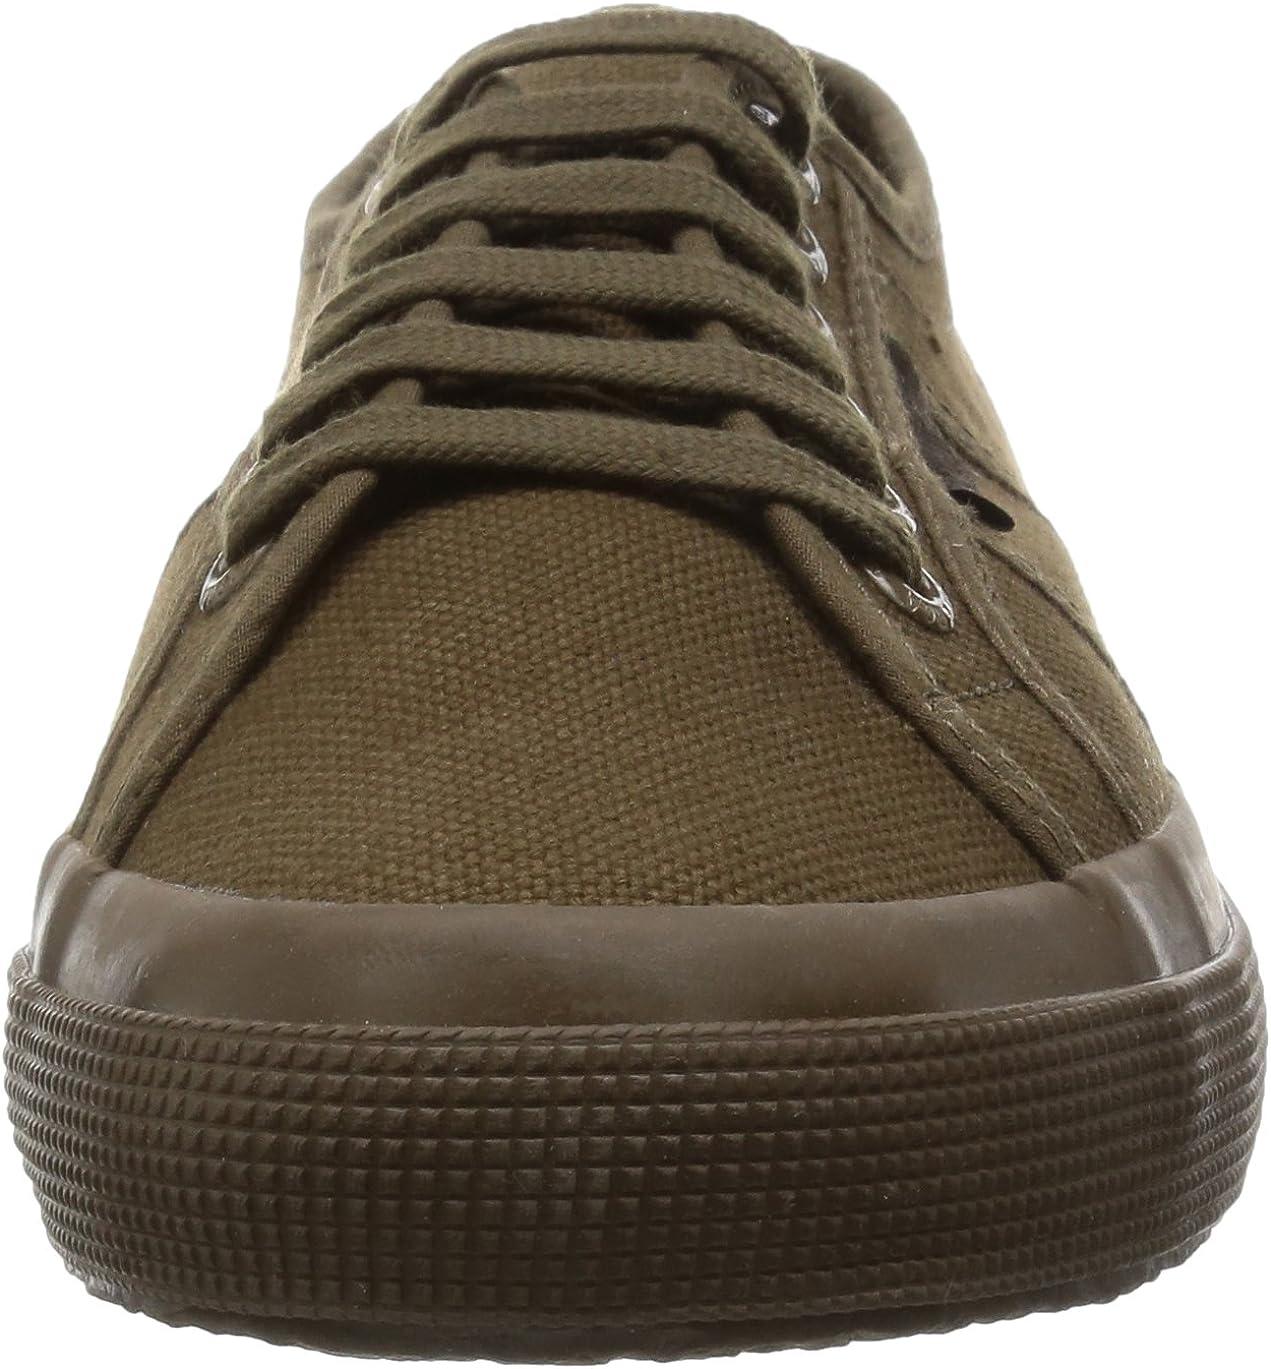 Superga 2750 Cotu Classic, Baskets Basses Mixte Adulte Vert Military Green 905